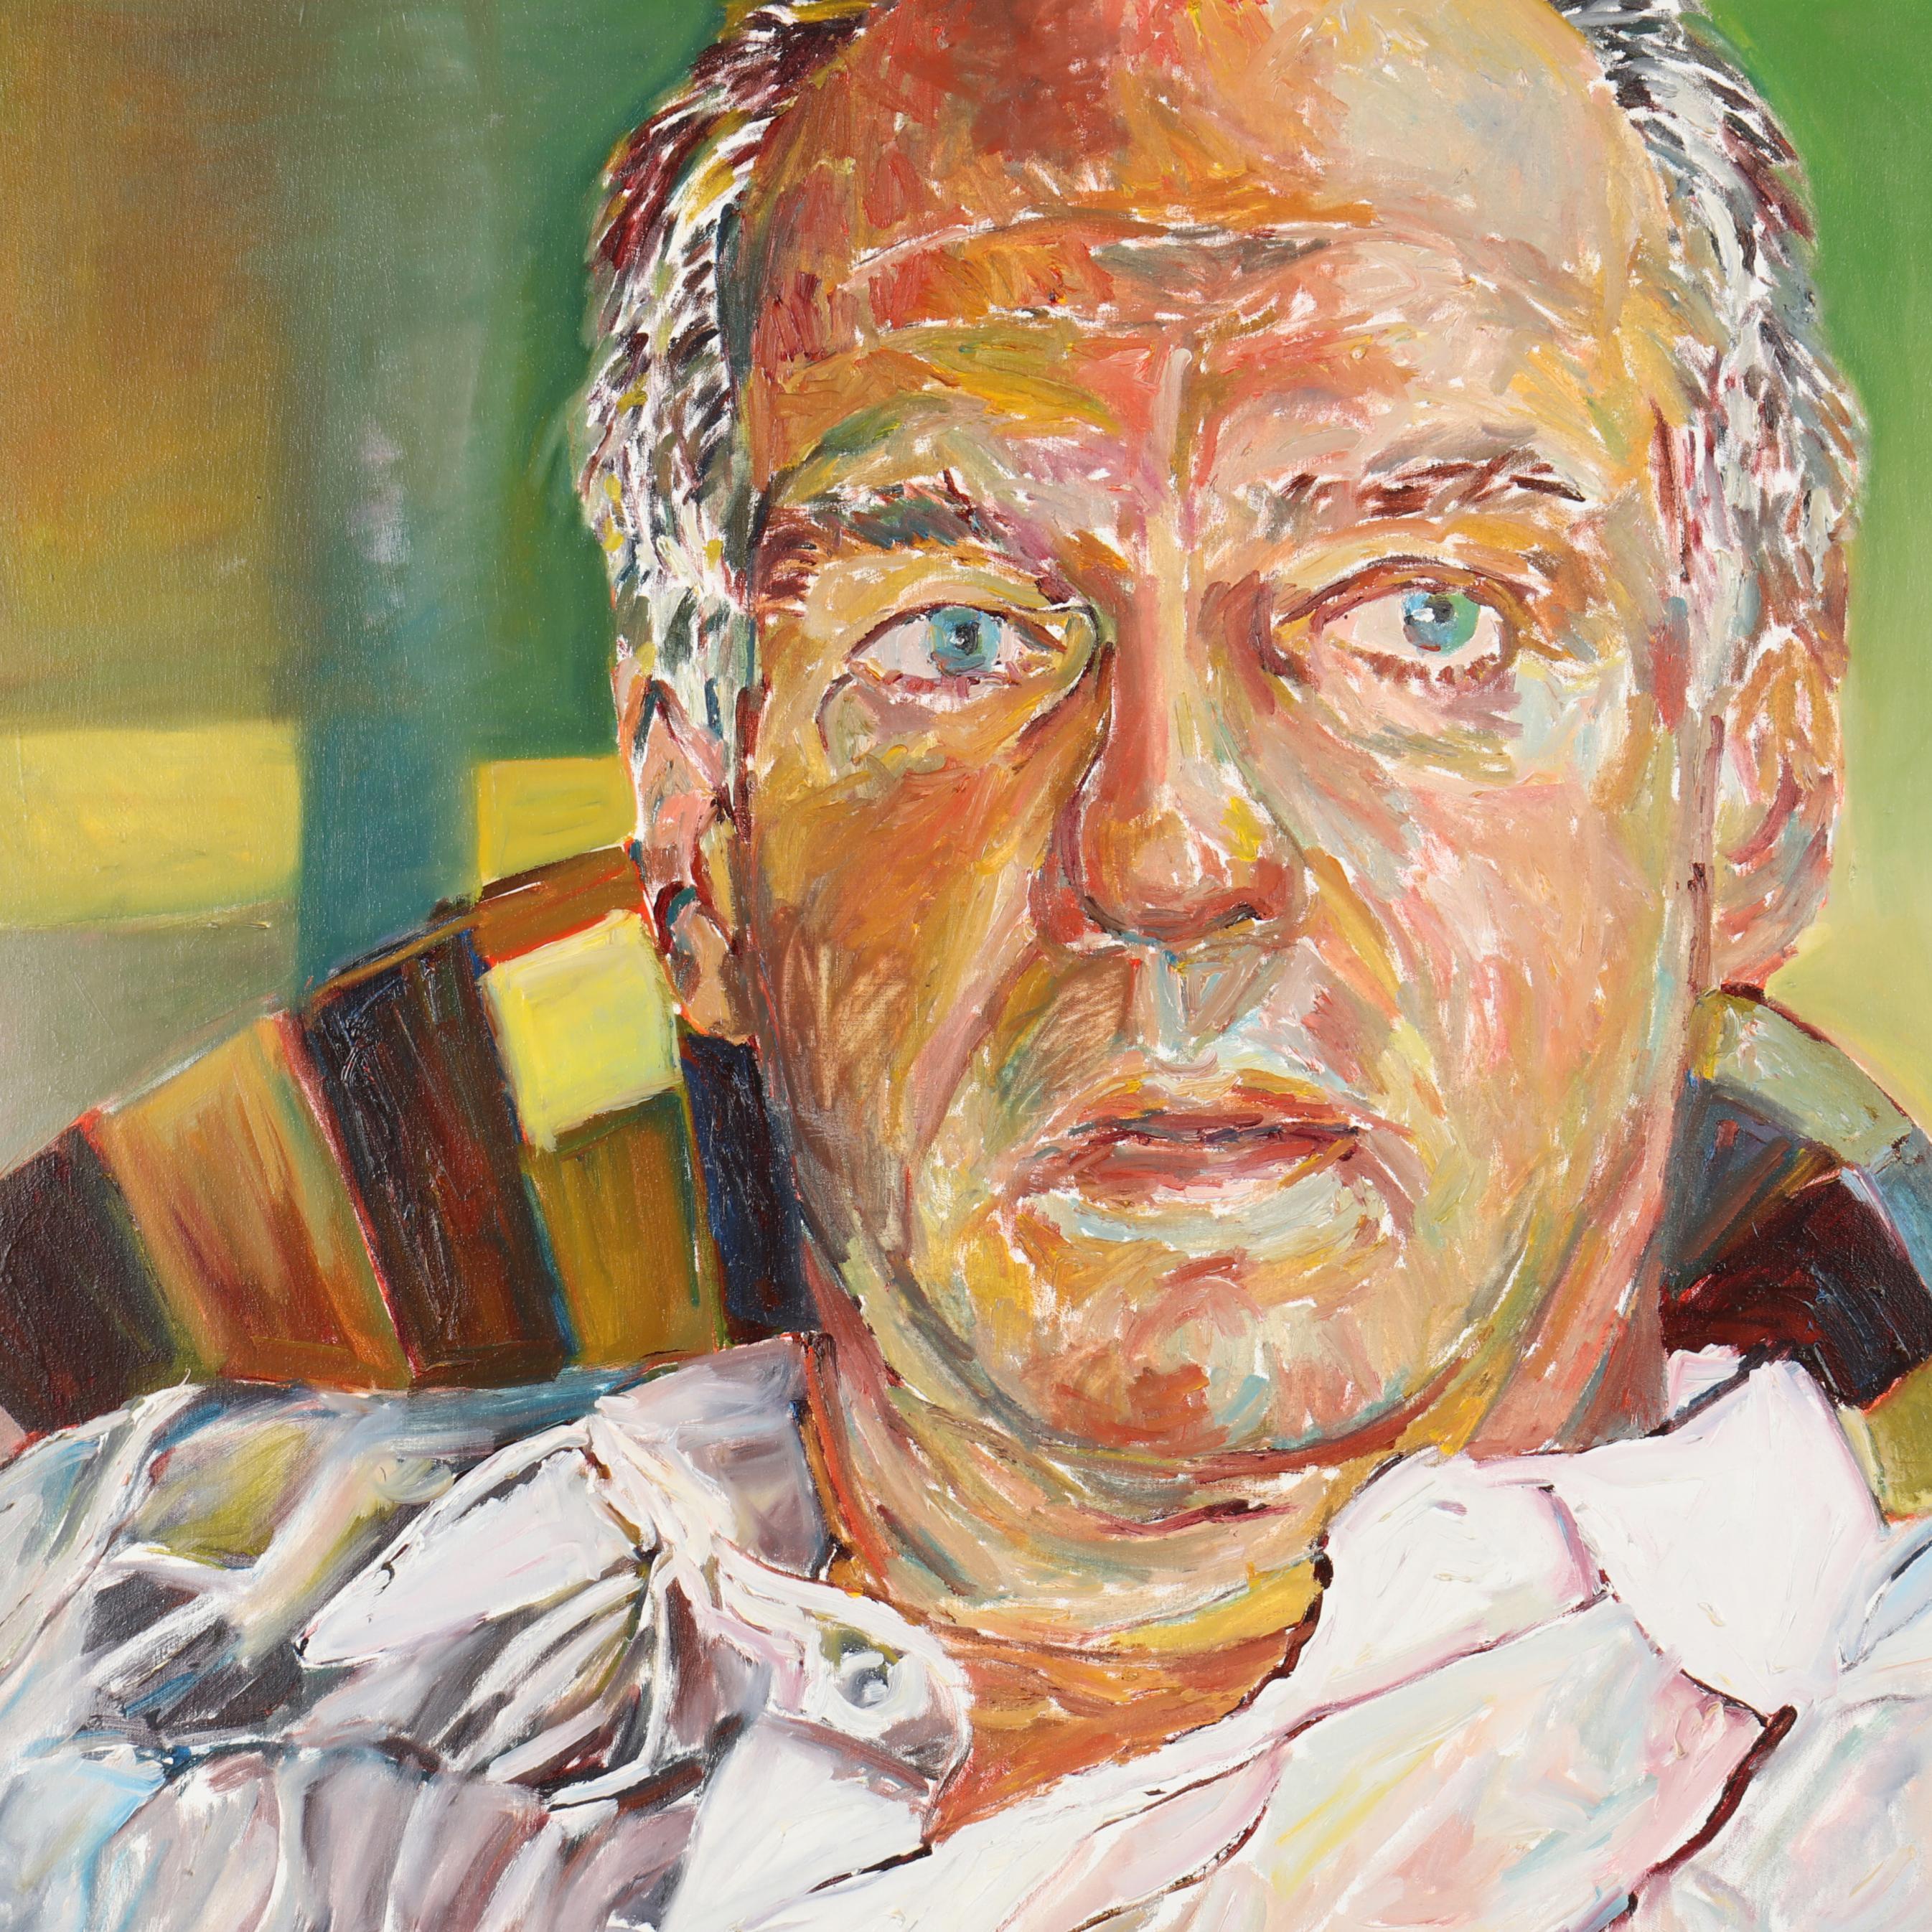 Larry Wheeler Reflects on the Life and Legacy of Joe Rowand